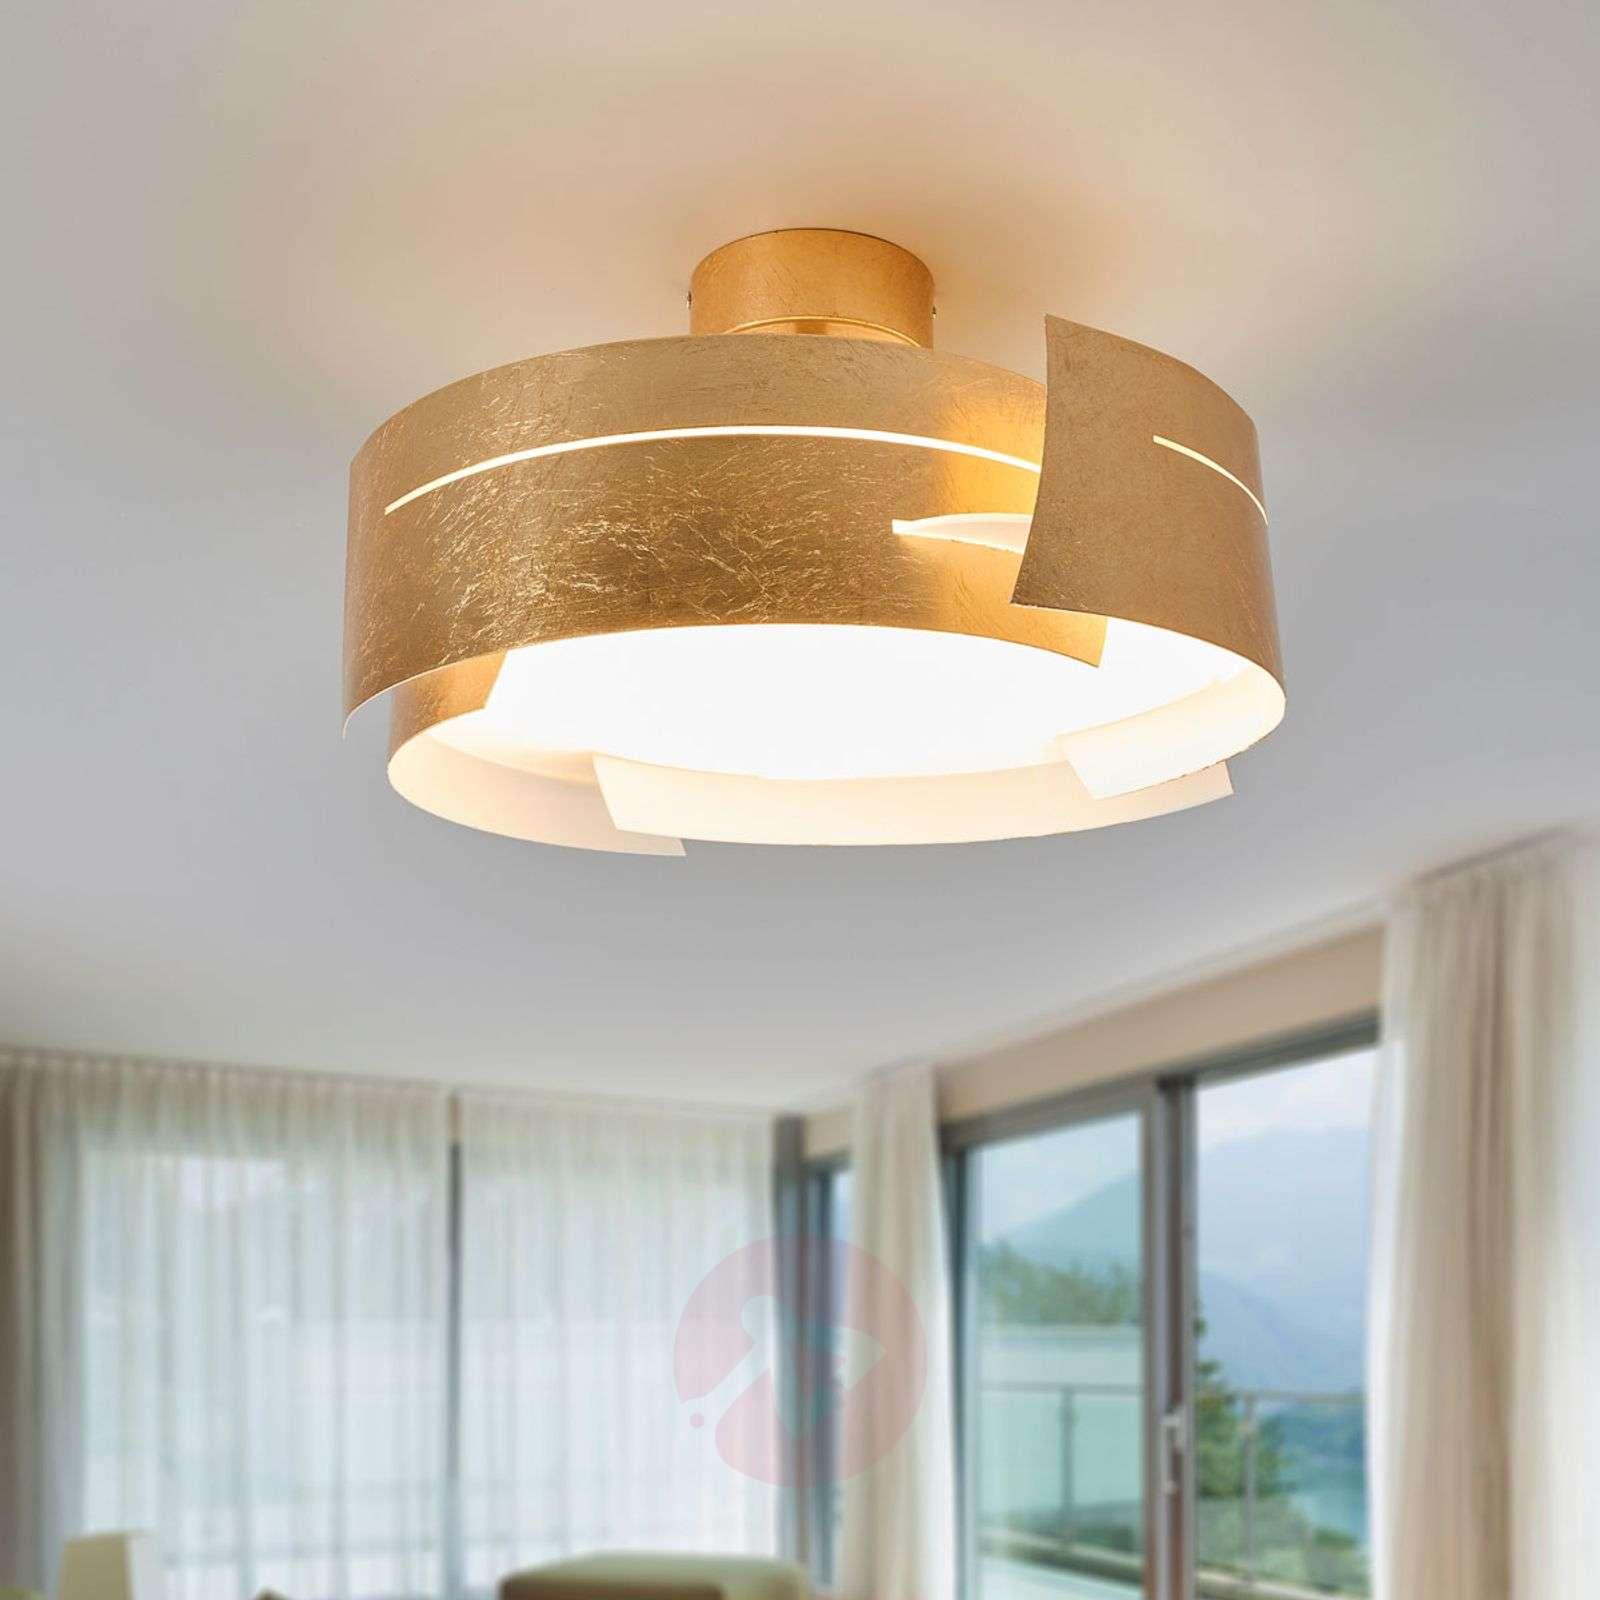 Attractive LED ceiling light Keyron, matt gold-9625119-01